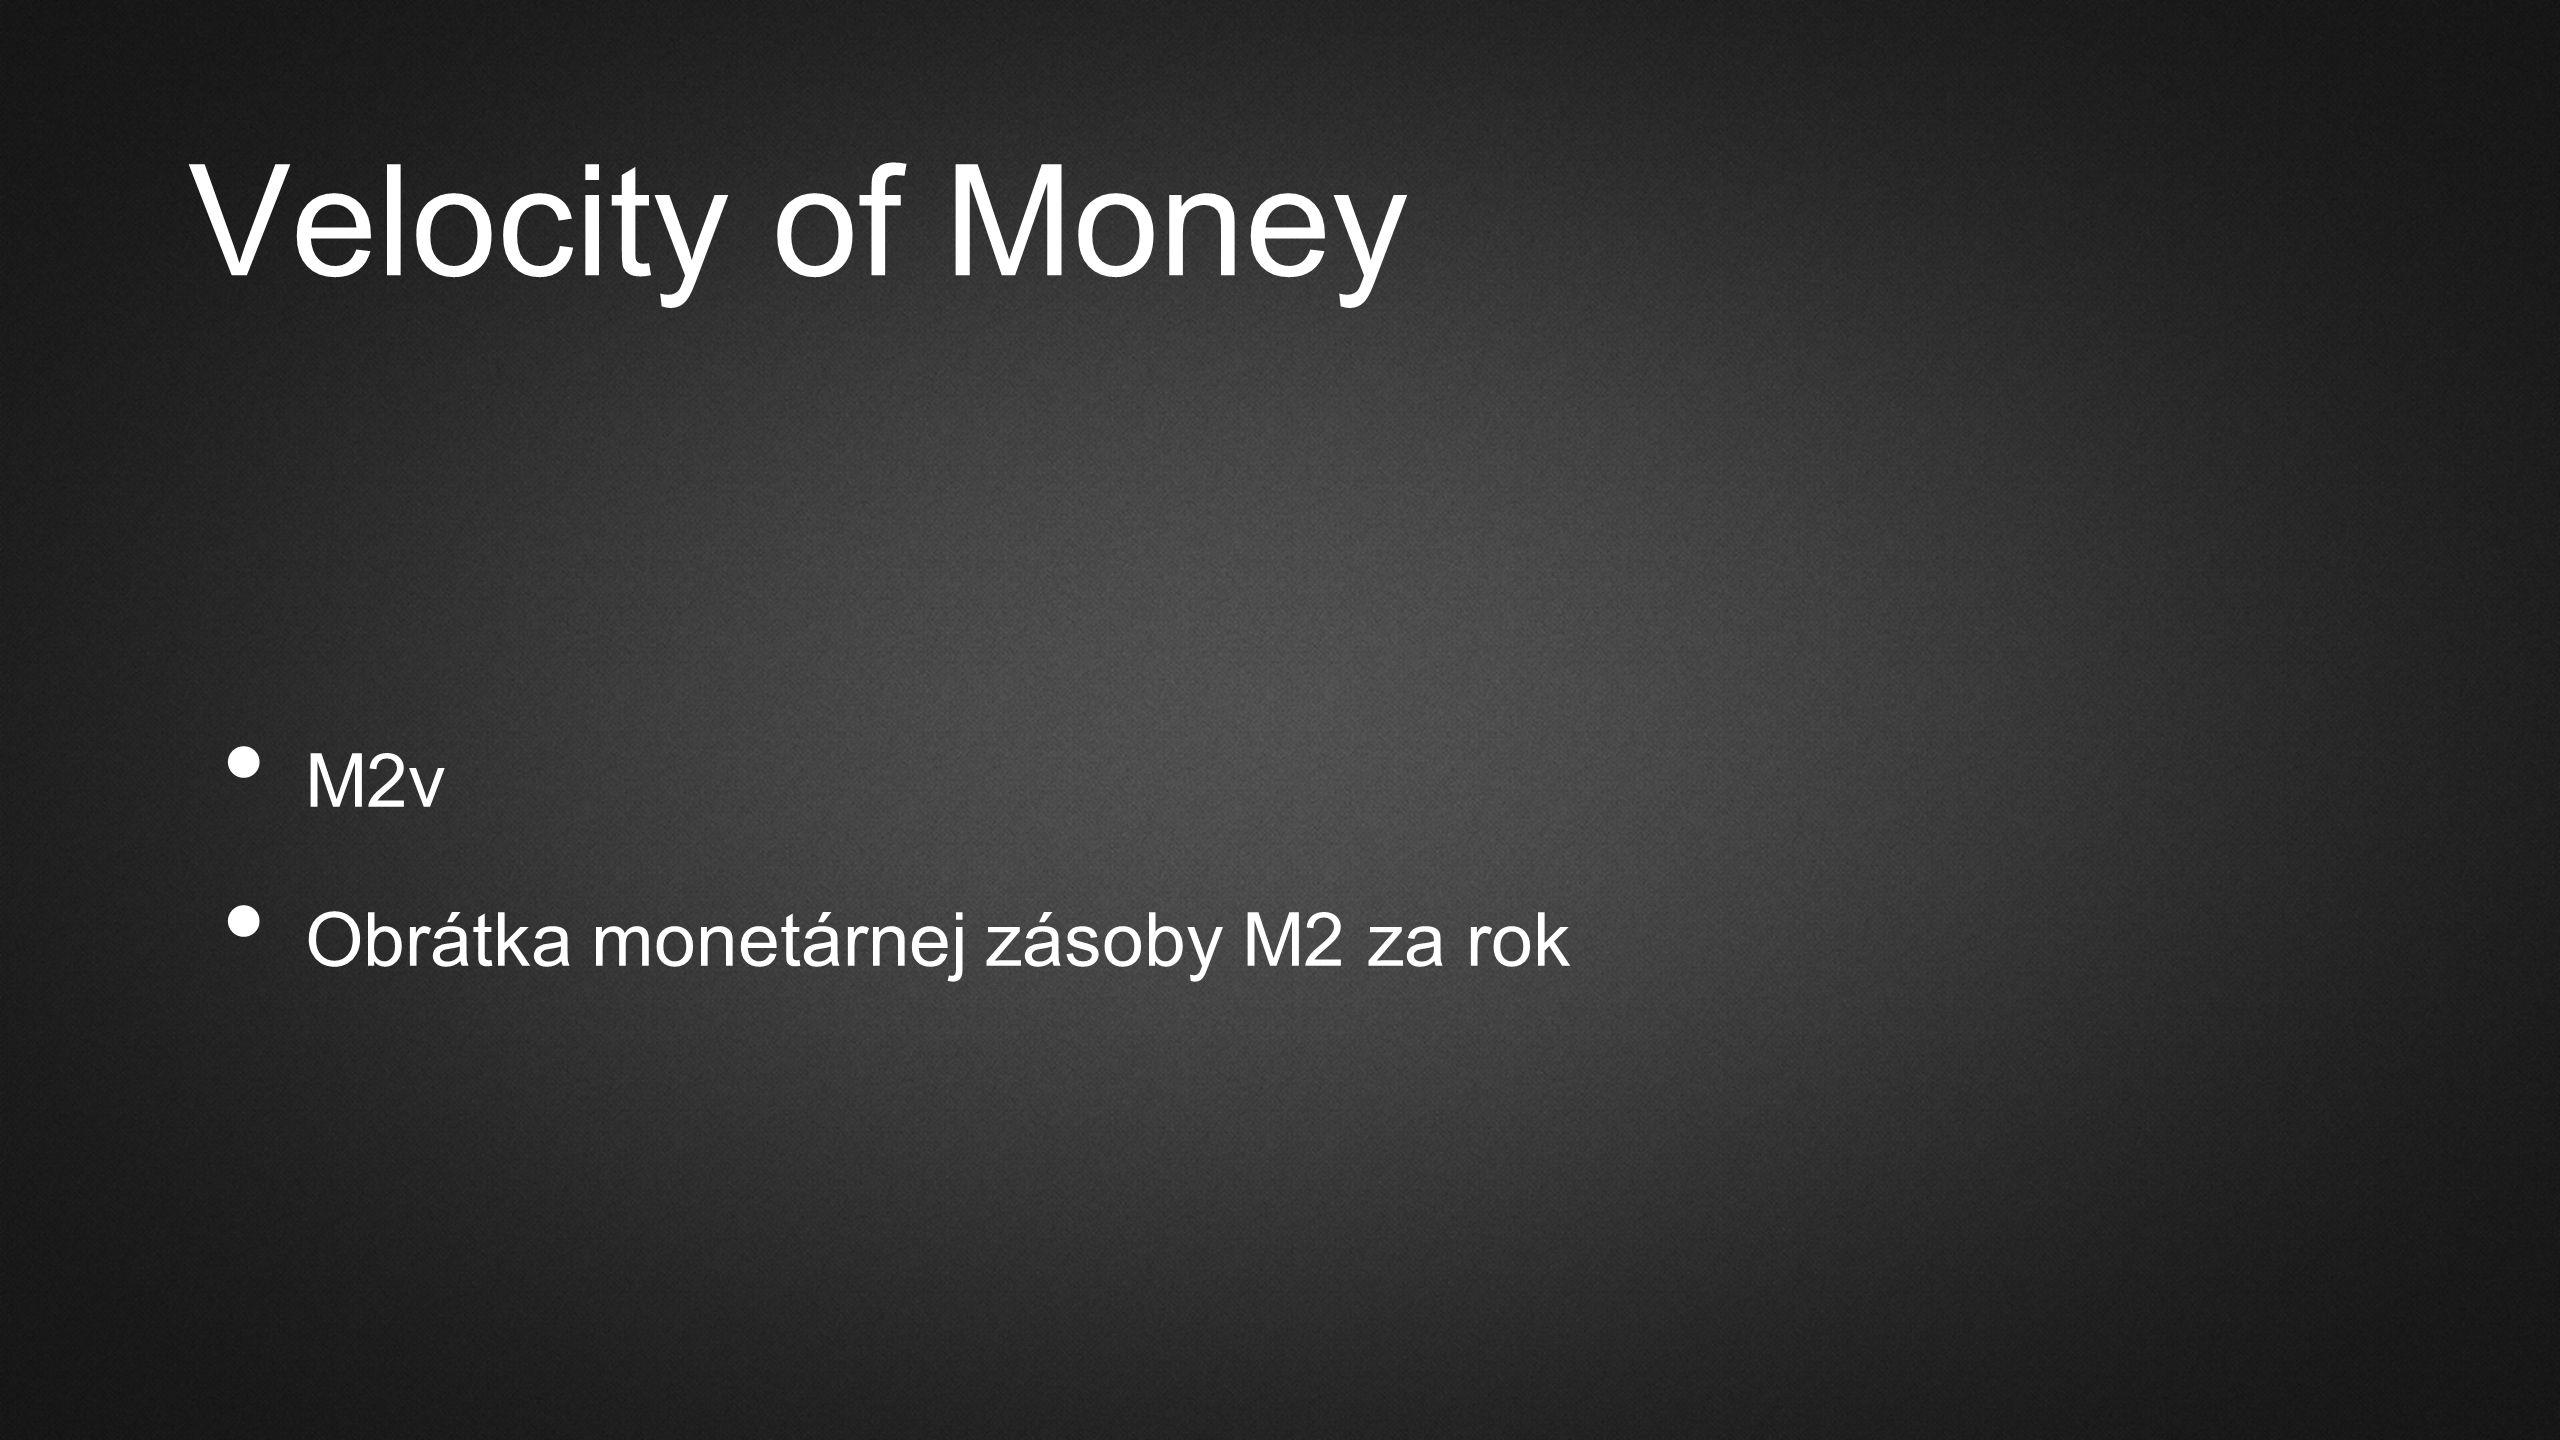 Velocity of Money M2v Obrátka monetárnej zásoby M2 za rok